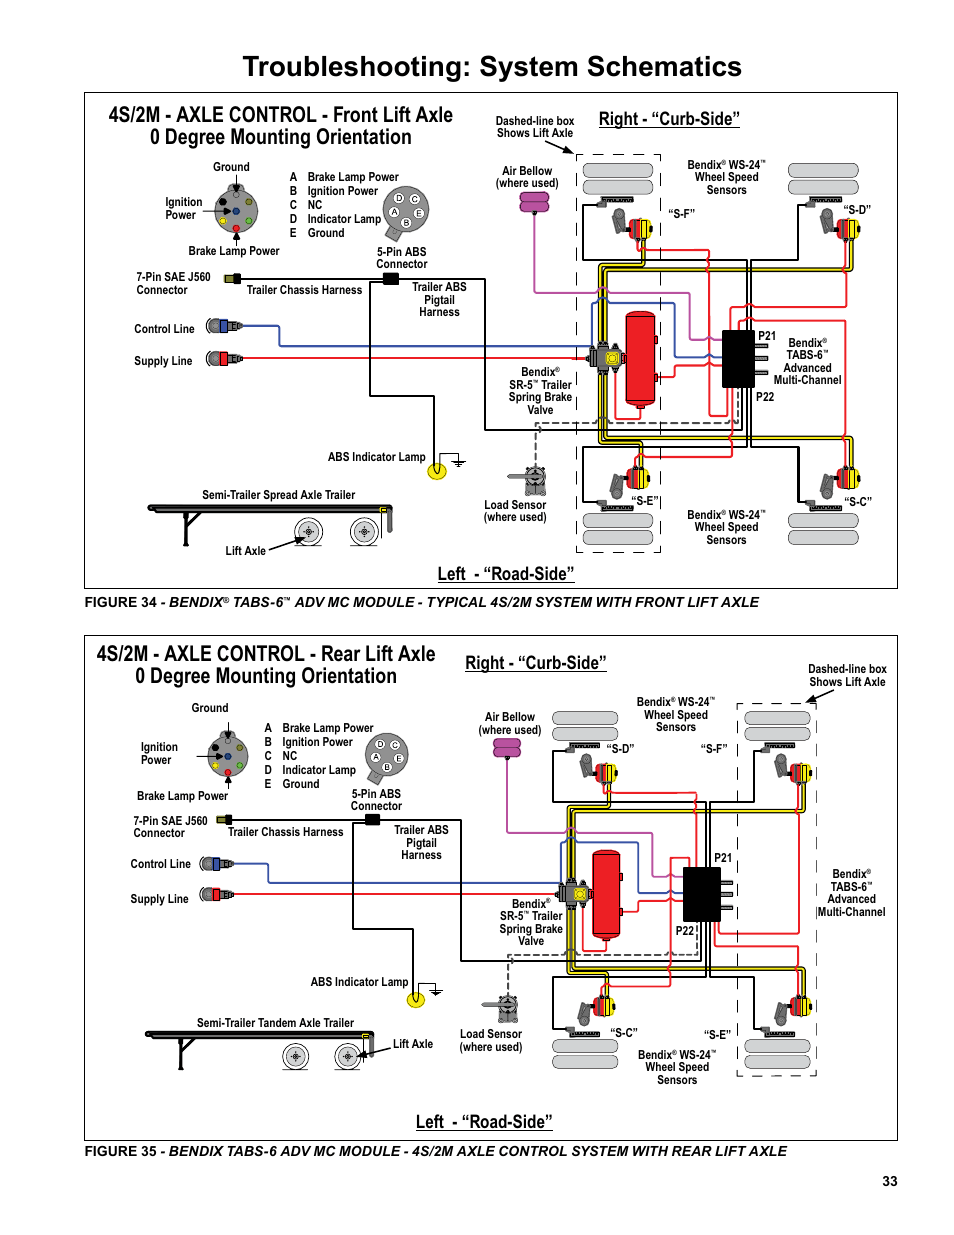 medium resolution of bendix trailer abs wiring diagram 33 wiring diagram bendix abs ecu wiring diagram bendix wiring diagrams for abs